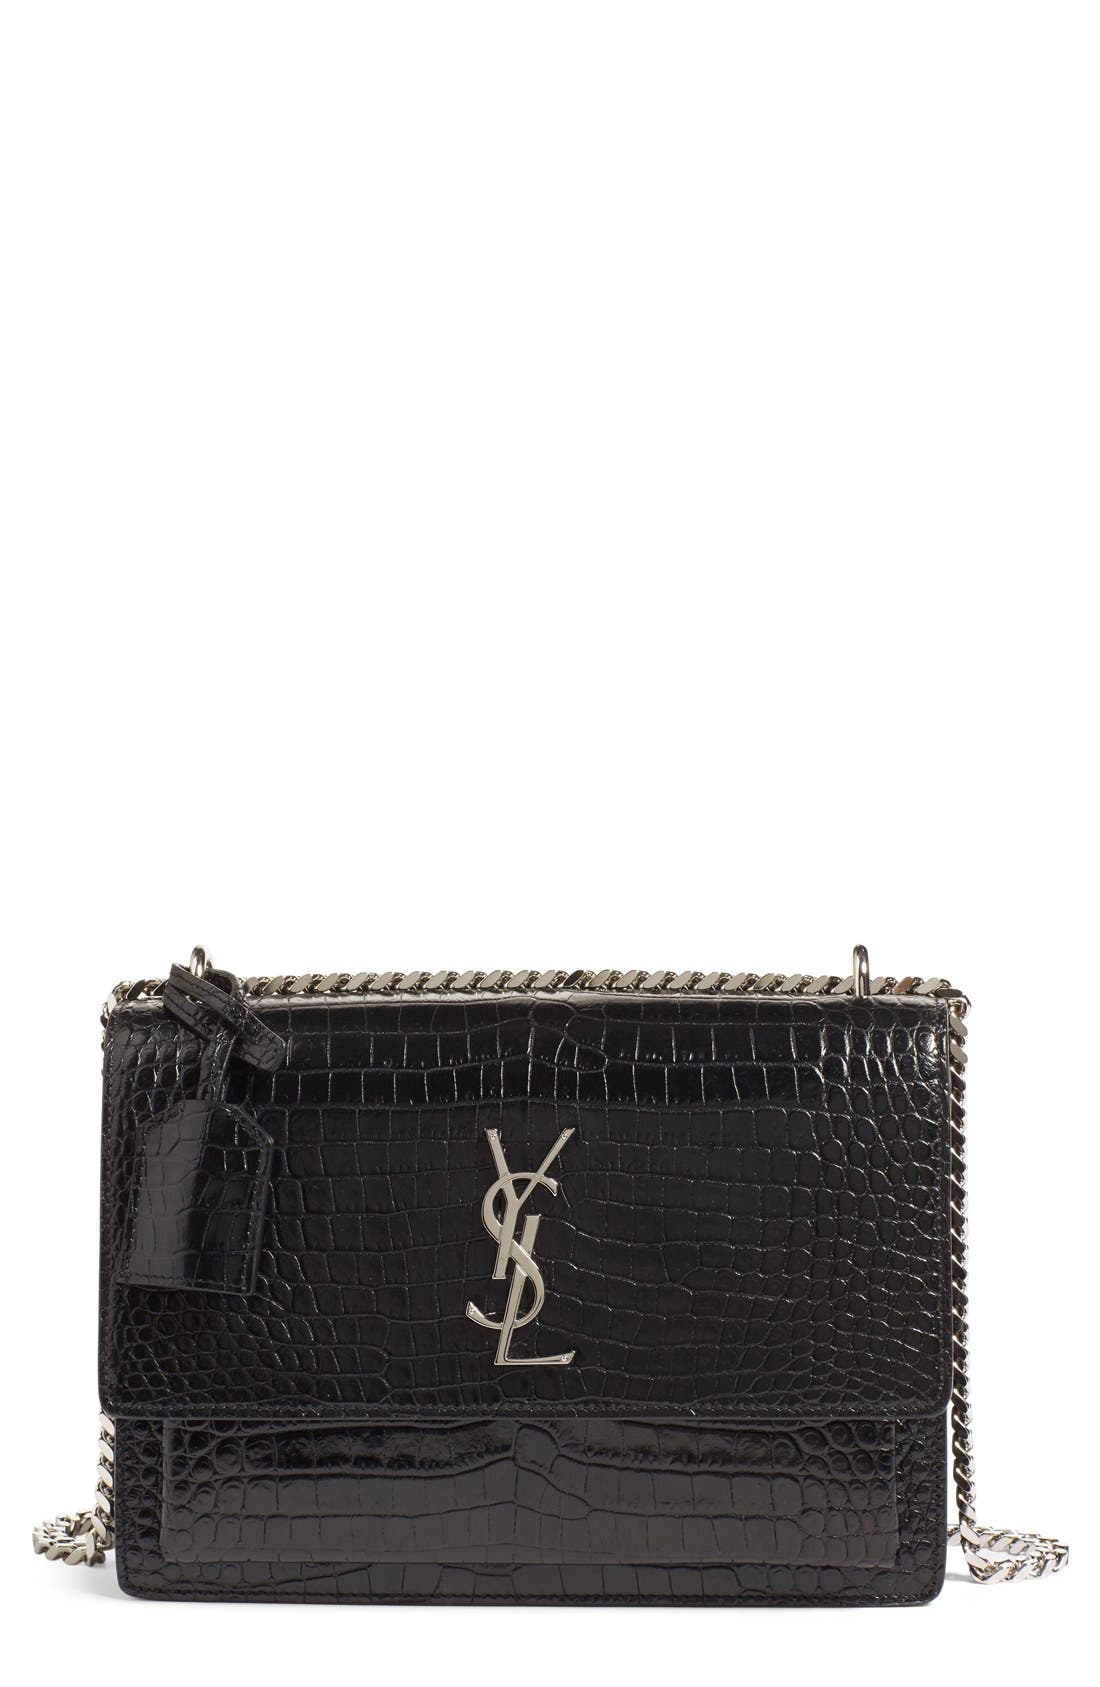 'Medium Monogram Sunset' Croc Embossed Leather Shoulder Bag,                             Main thumbnail 1, color,                             Nero